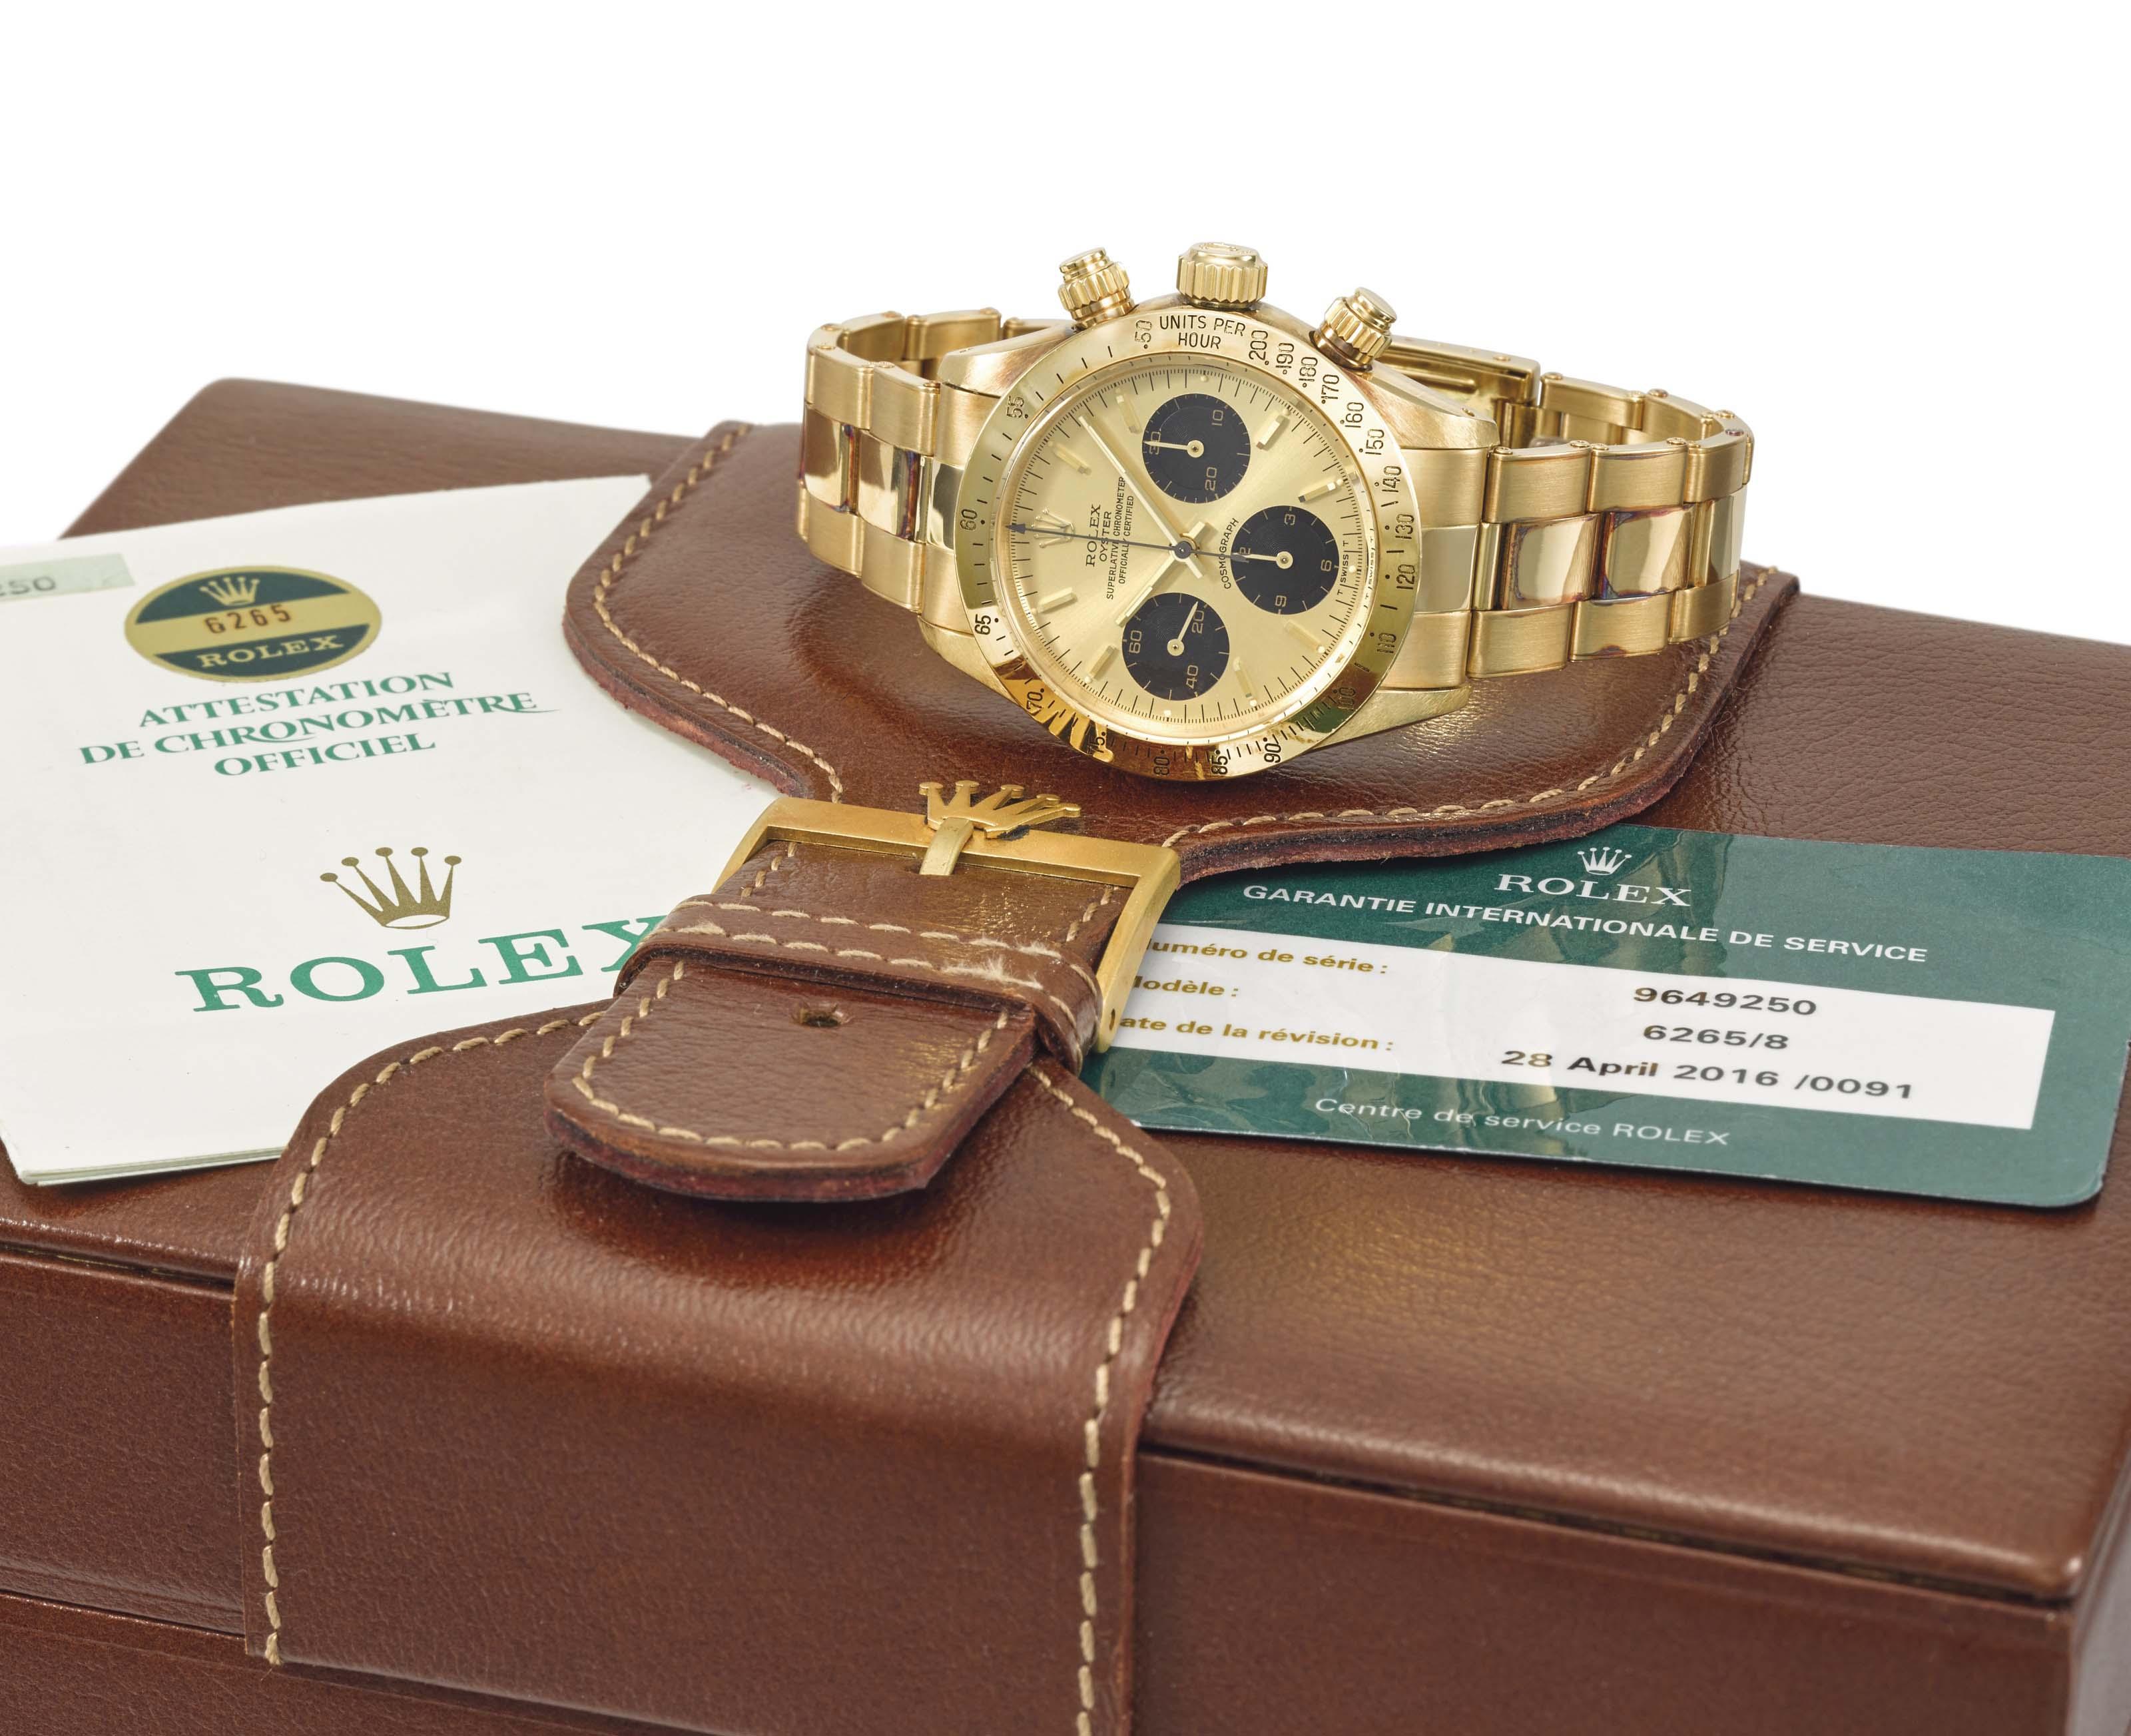 Rolex A very rare and very fine 18K gold chronograph wristwa...